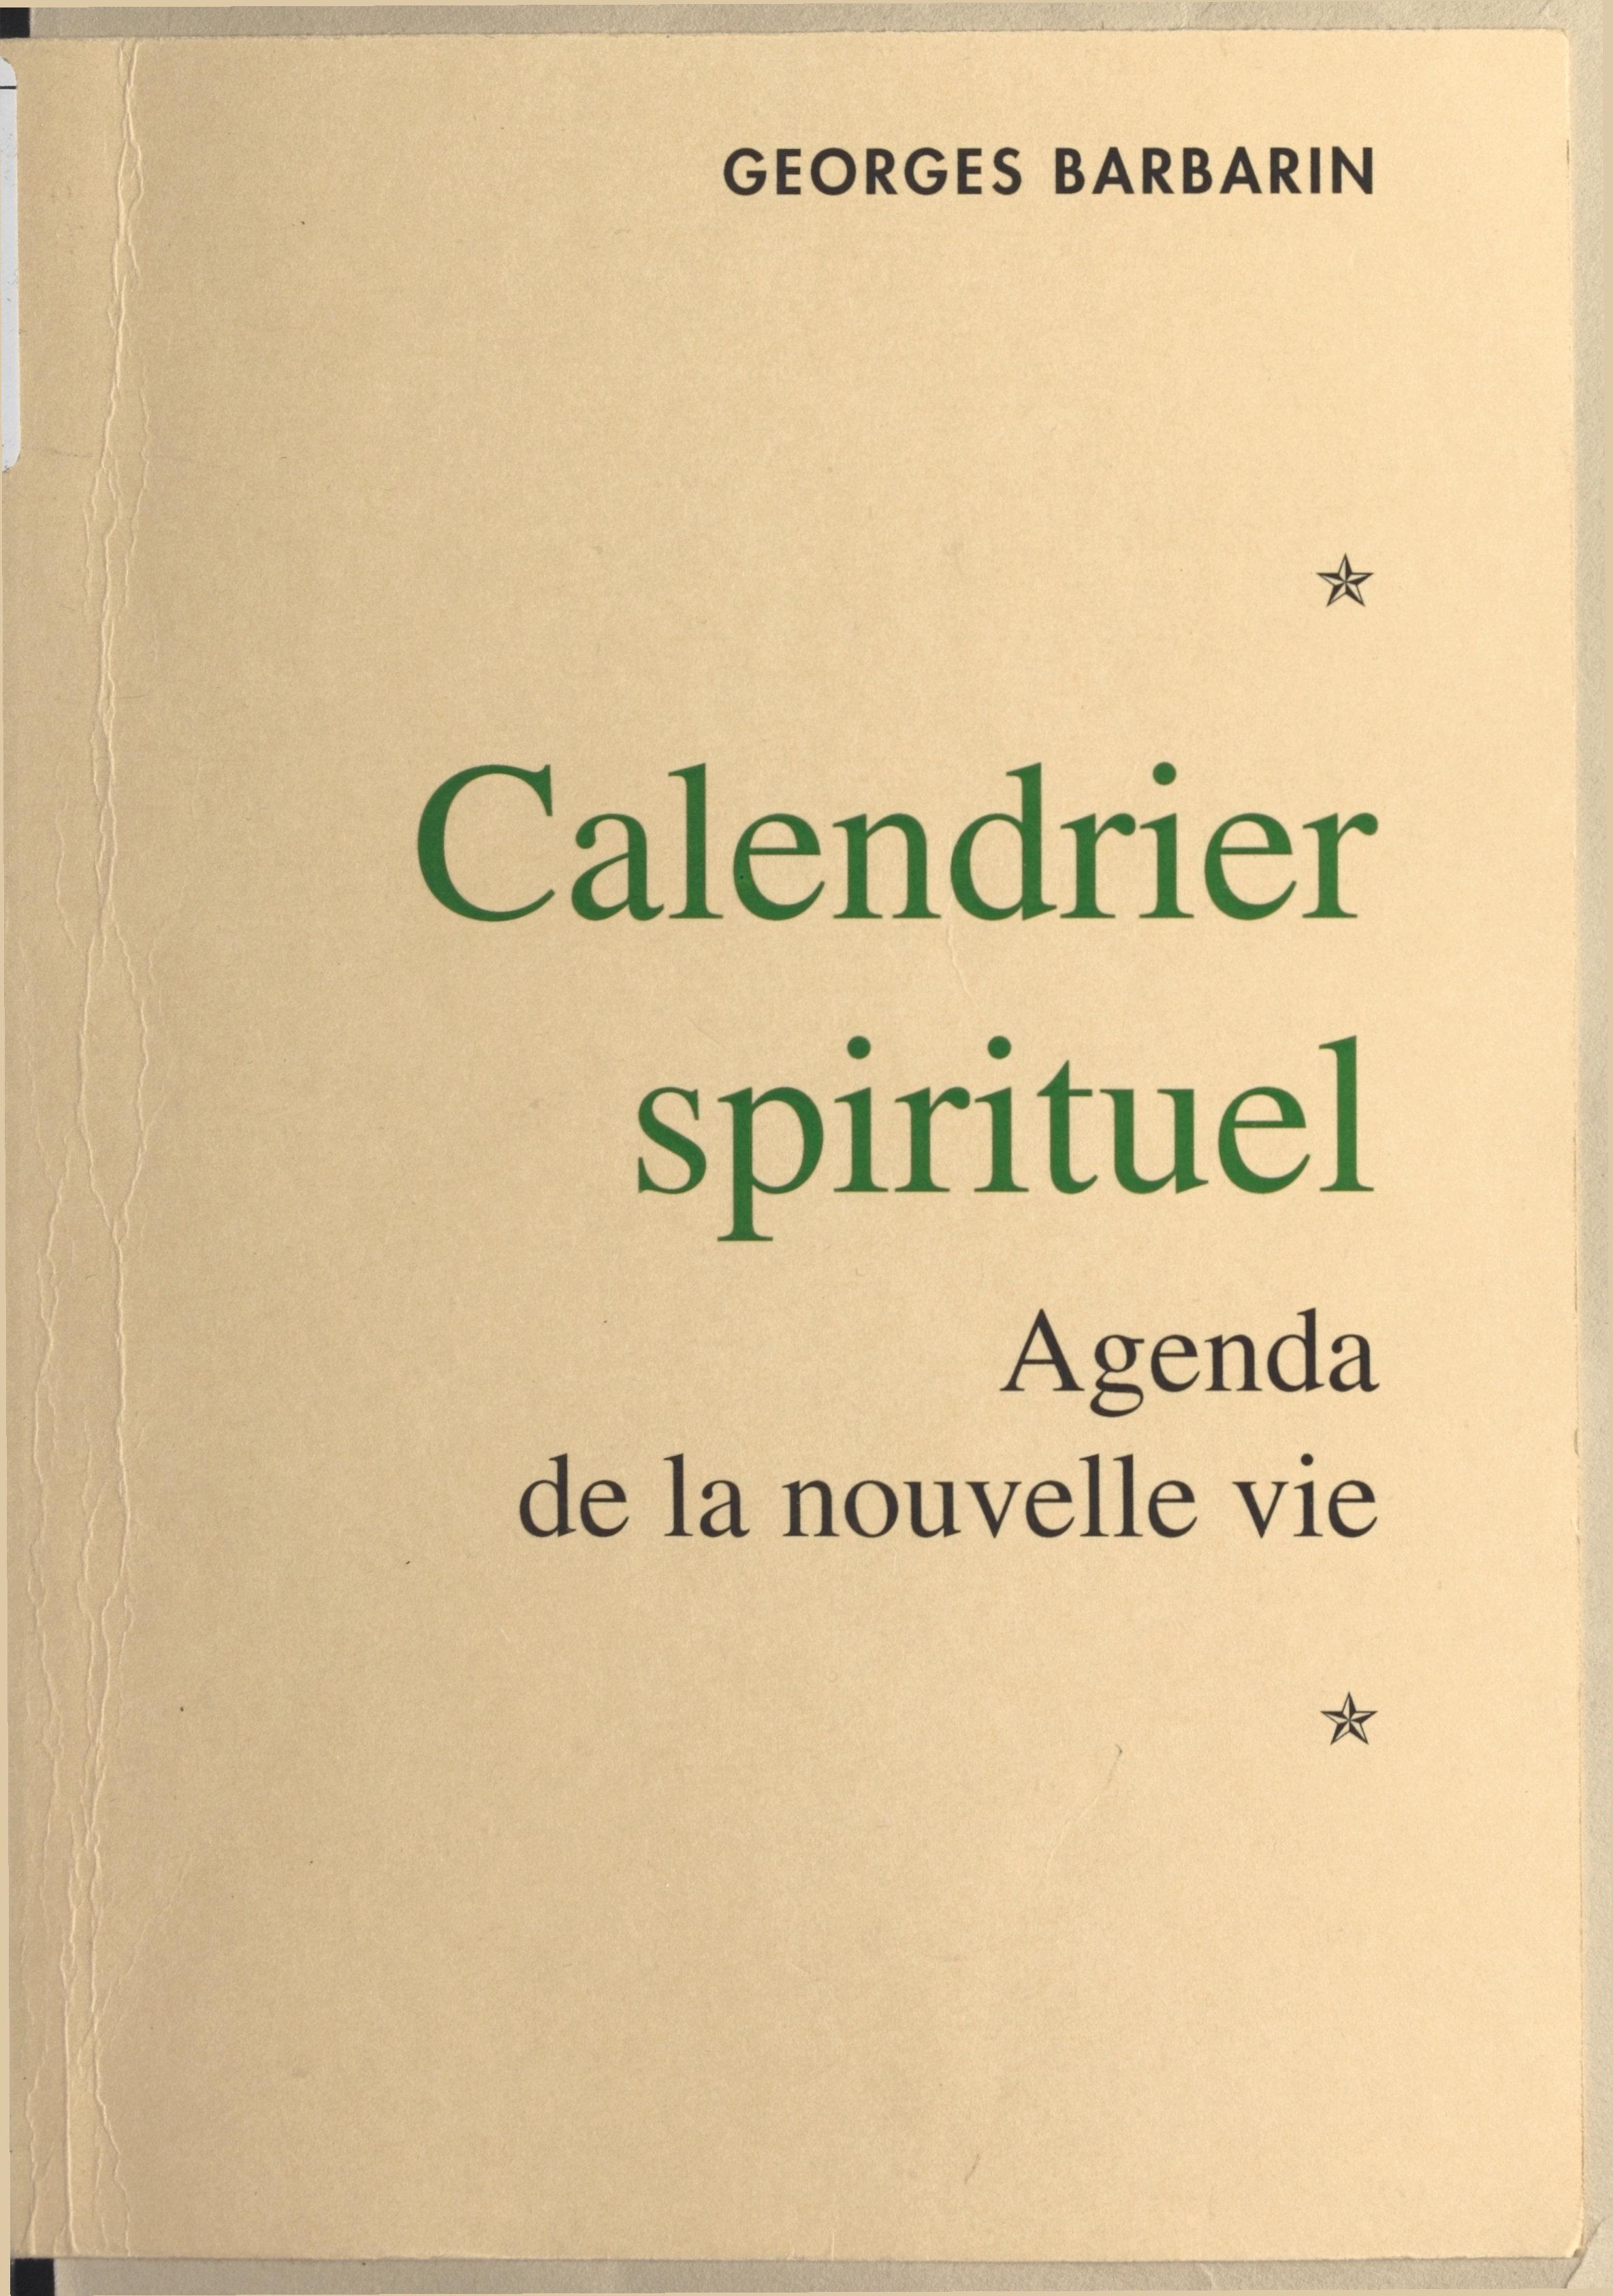 Calendrier spirituel